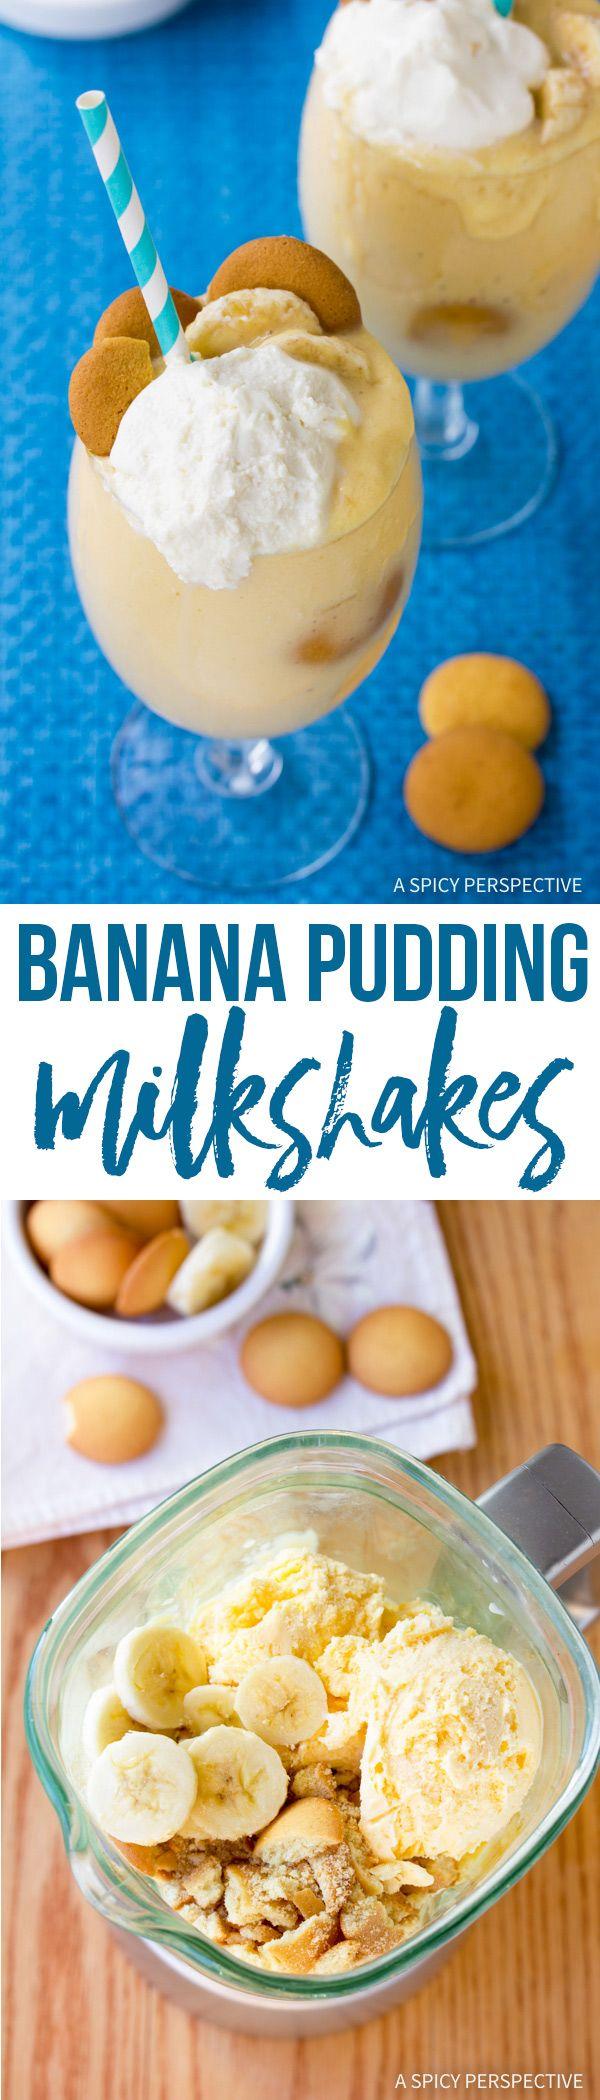 The BEST Banana Pudding Milkshake Recipe via @spicyperspectiv